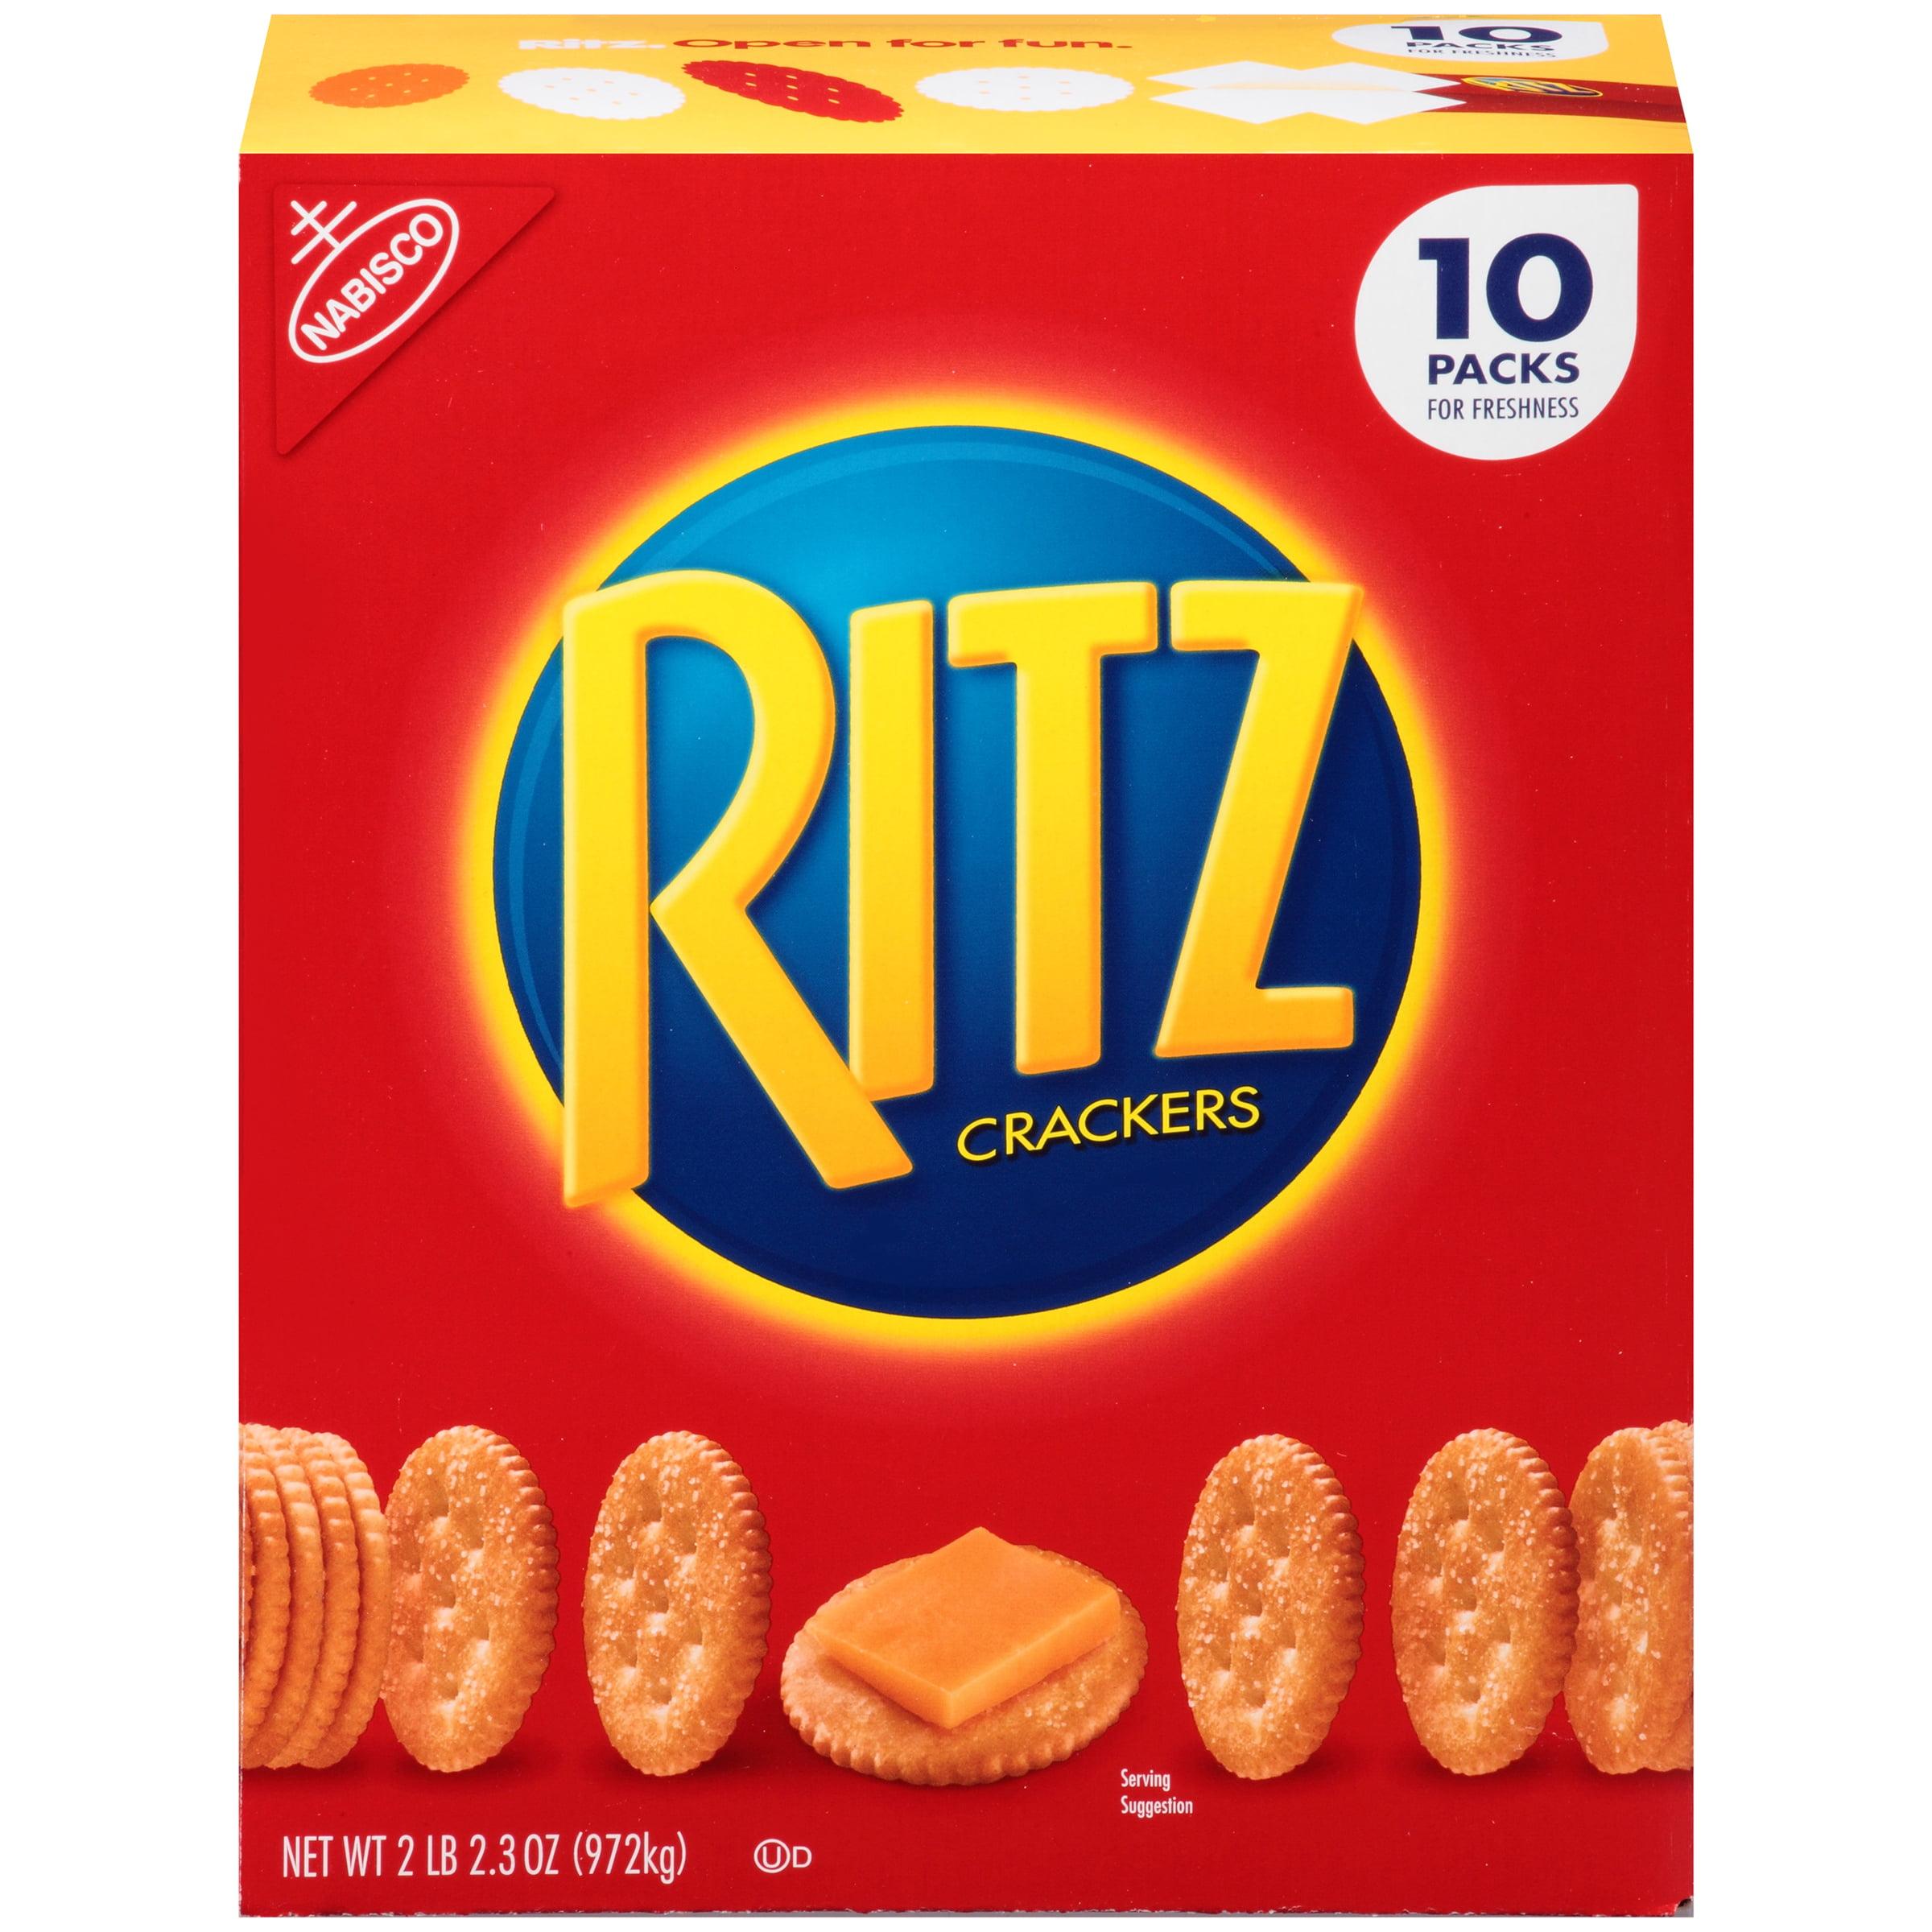 Nabisco Ritz Original Crackers, 10 Packs, 34.3 oz